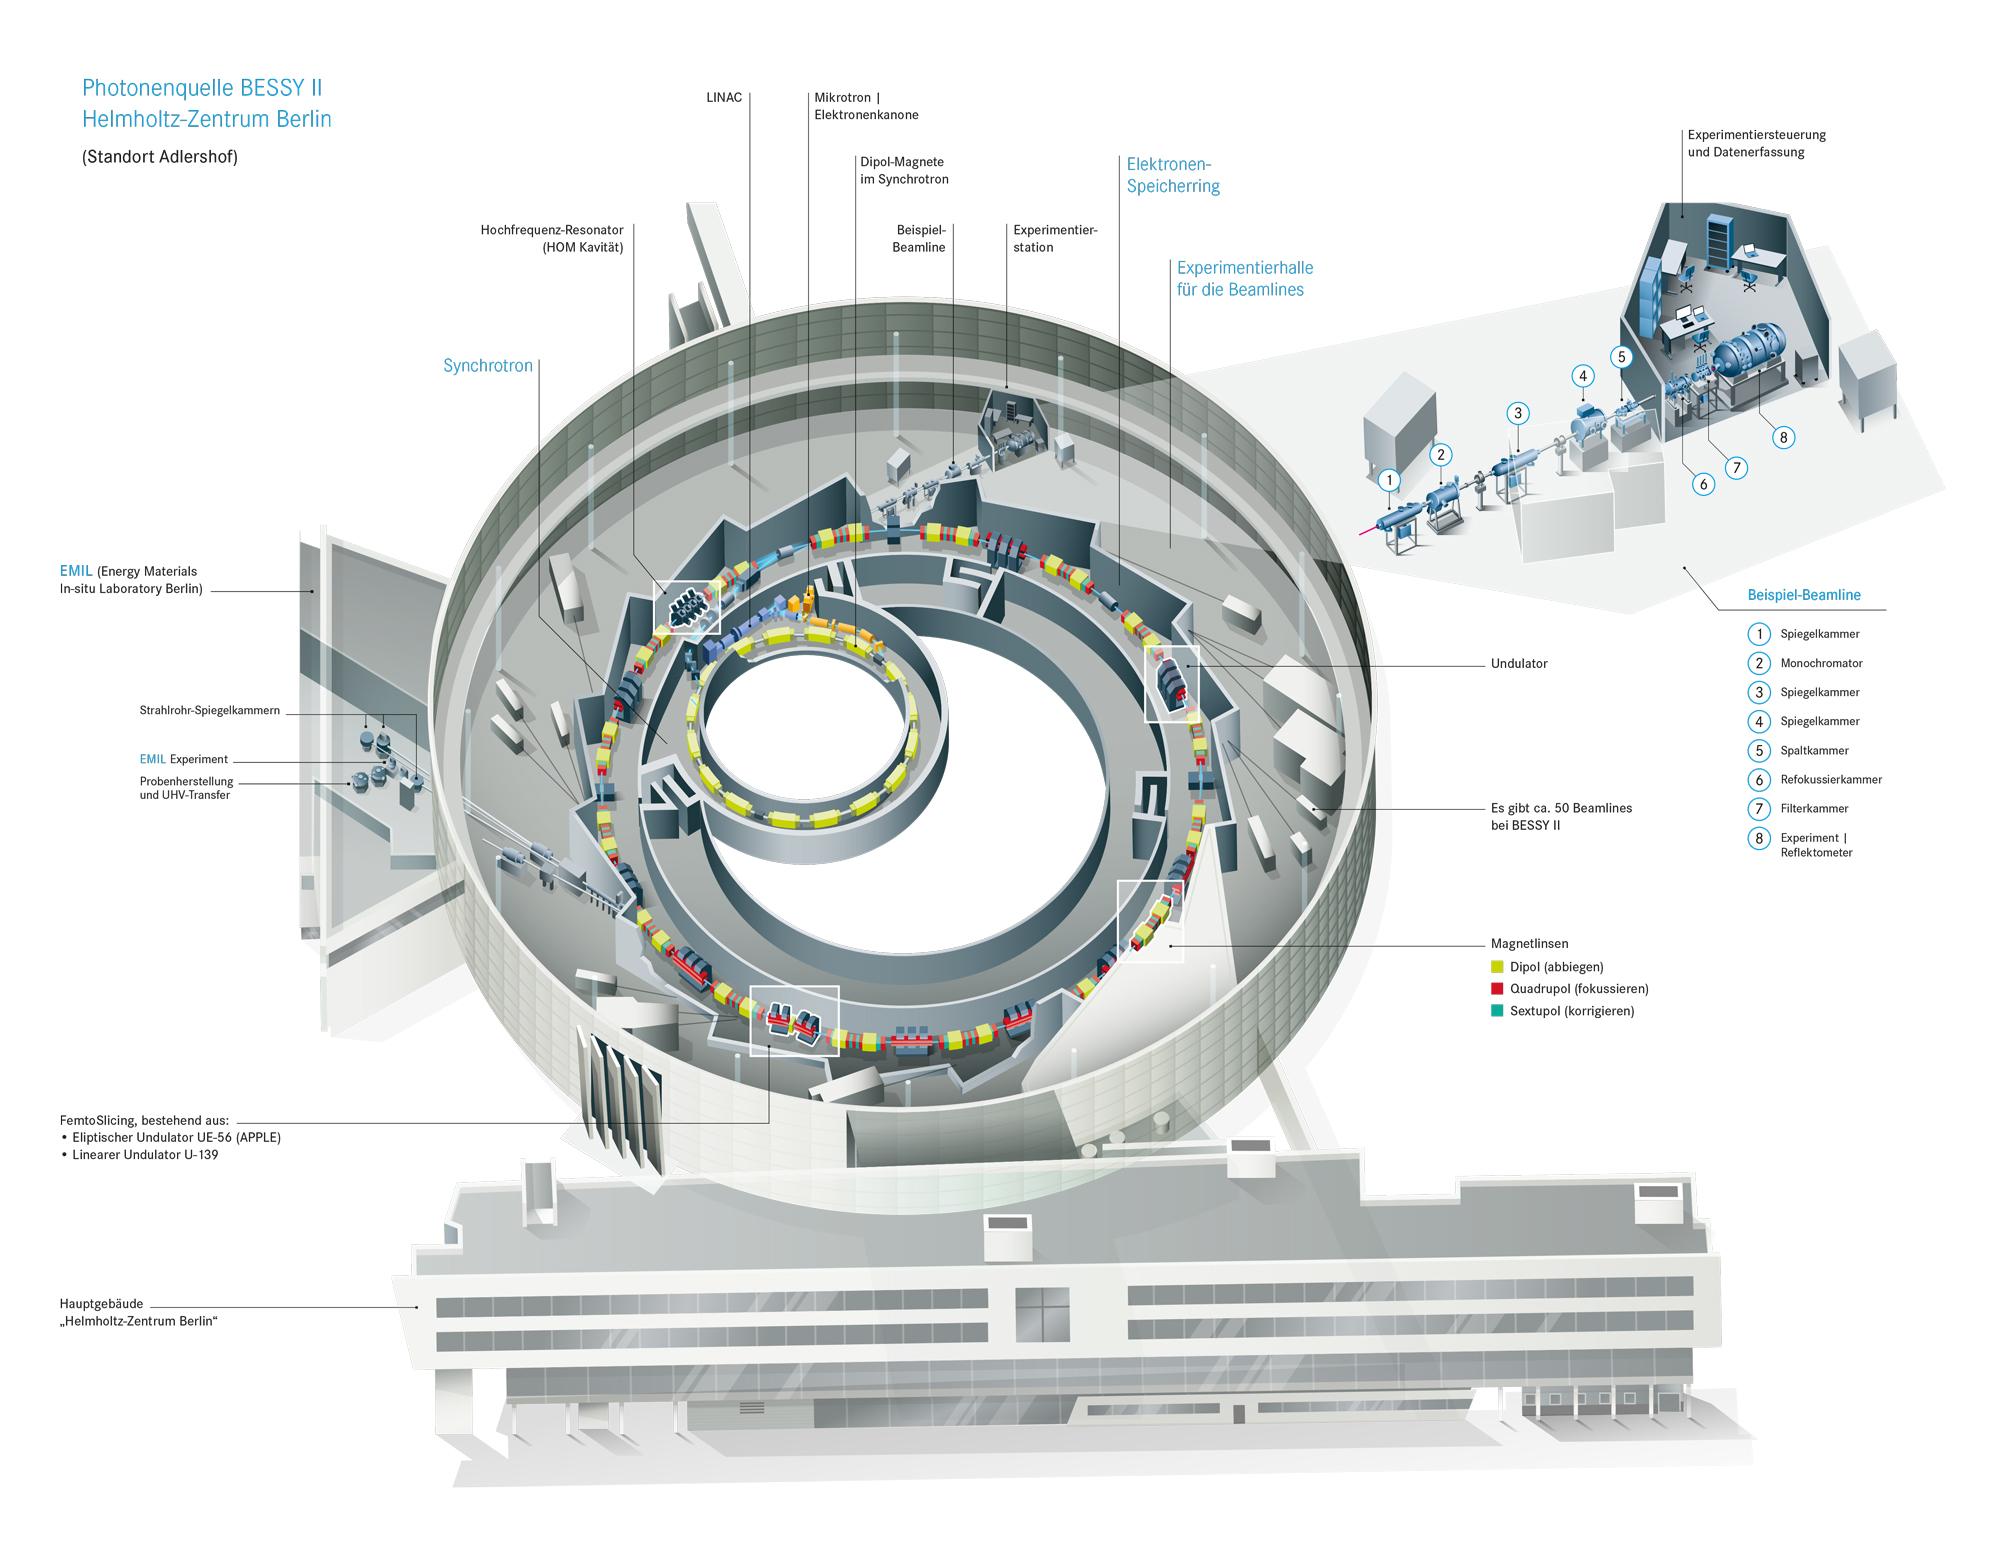 hzb-infografik-bessy-2015-002_de_web